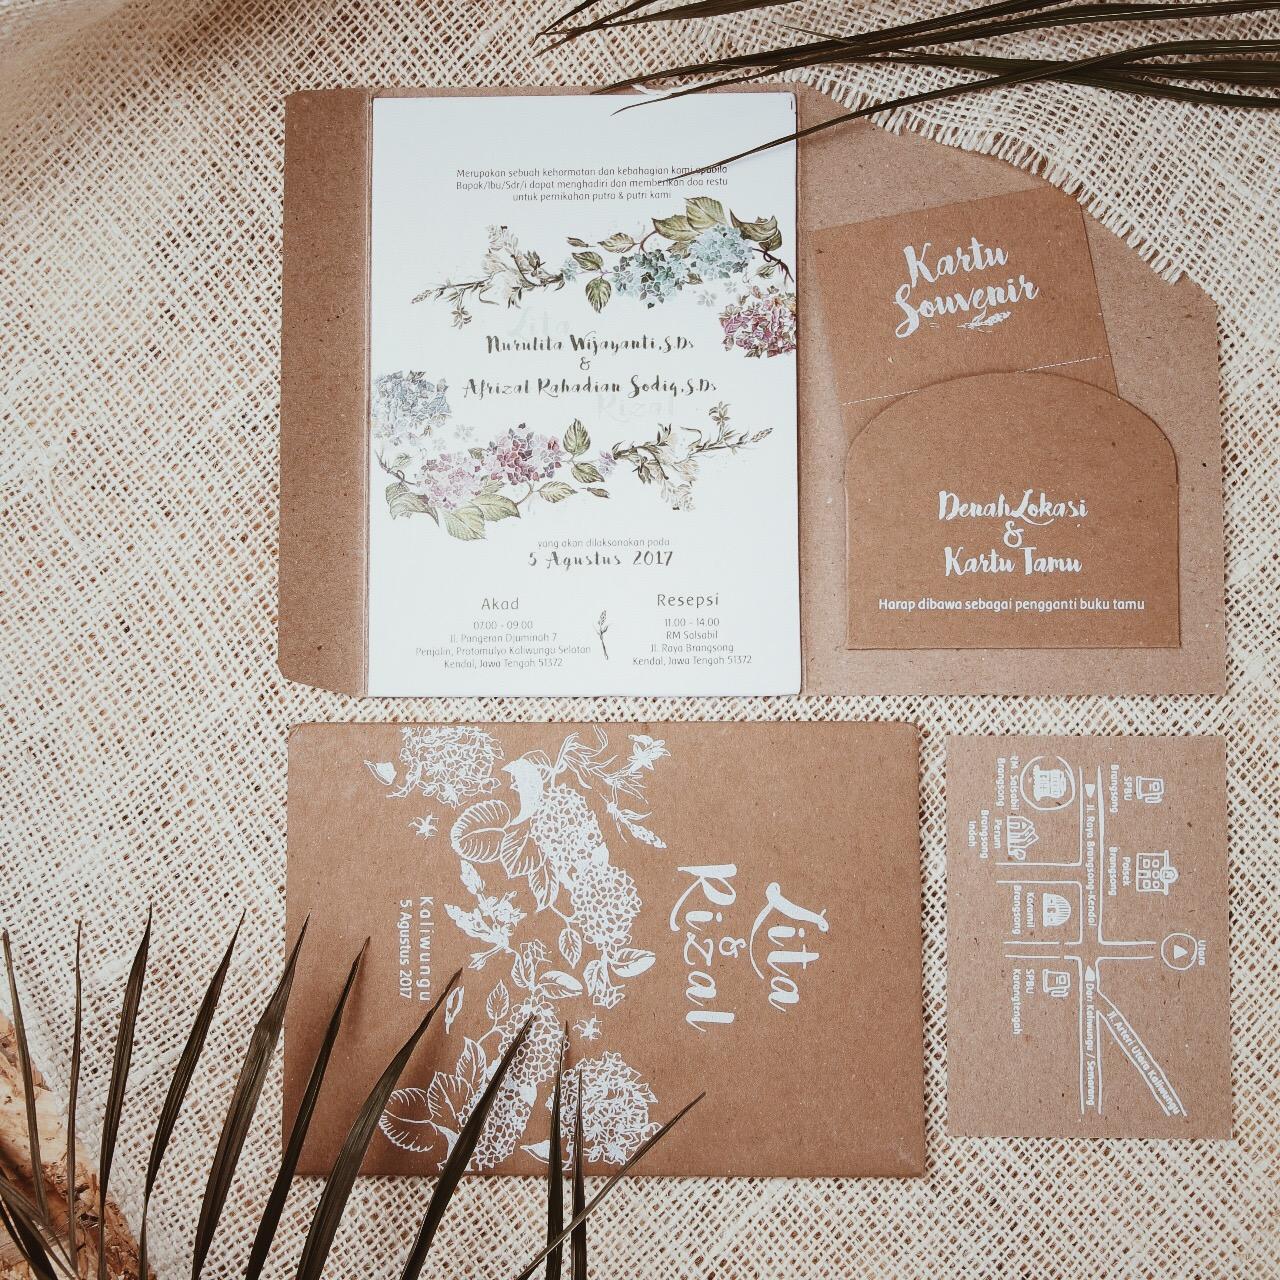 Foyya wedding invitations in jakarta bridestory stopboris Gallery